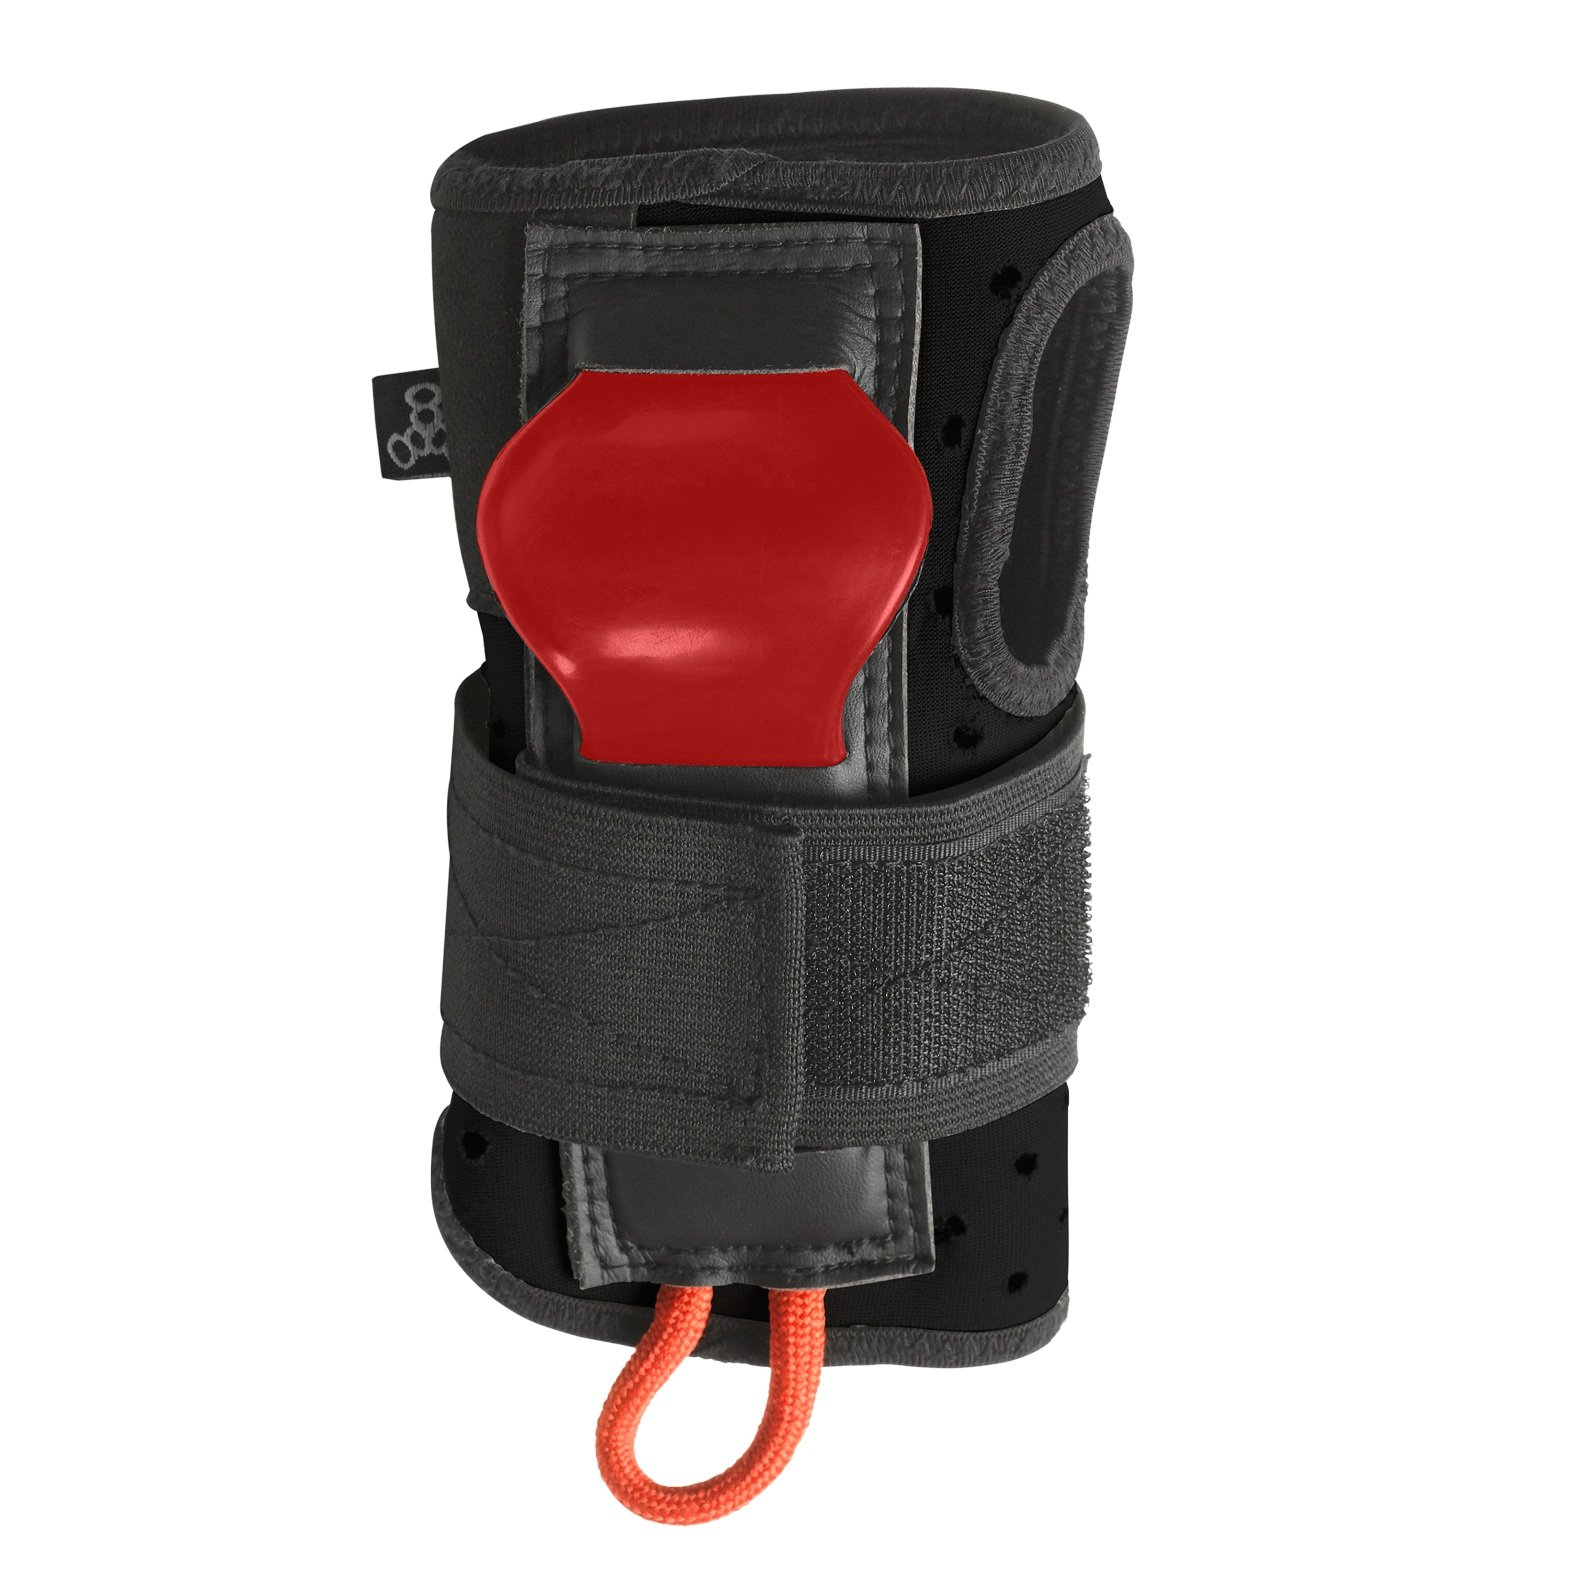 Triple Eight RD Wristsaver Wrist Guards for Roller Derby and Skateboarding, Medium